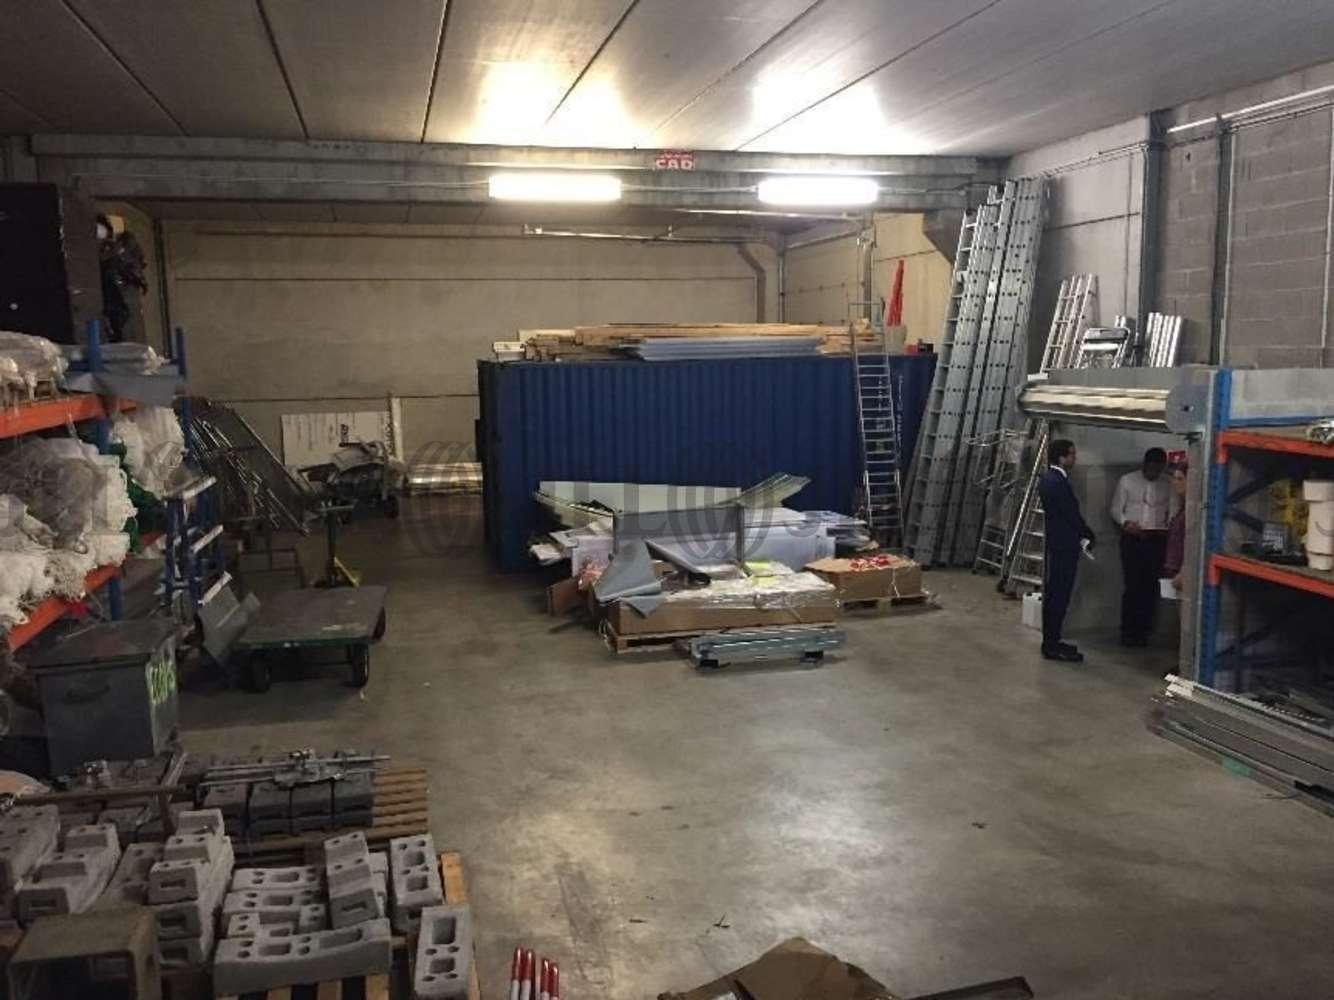 Activités/entrepôt Chaponnay, 69970 - BÂTIMENT MIXTE LYON SUD - CHAPONNAY - 9531900